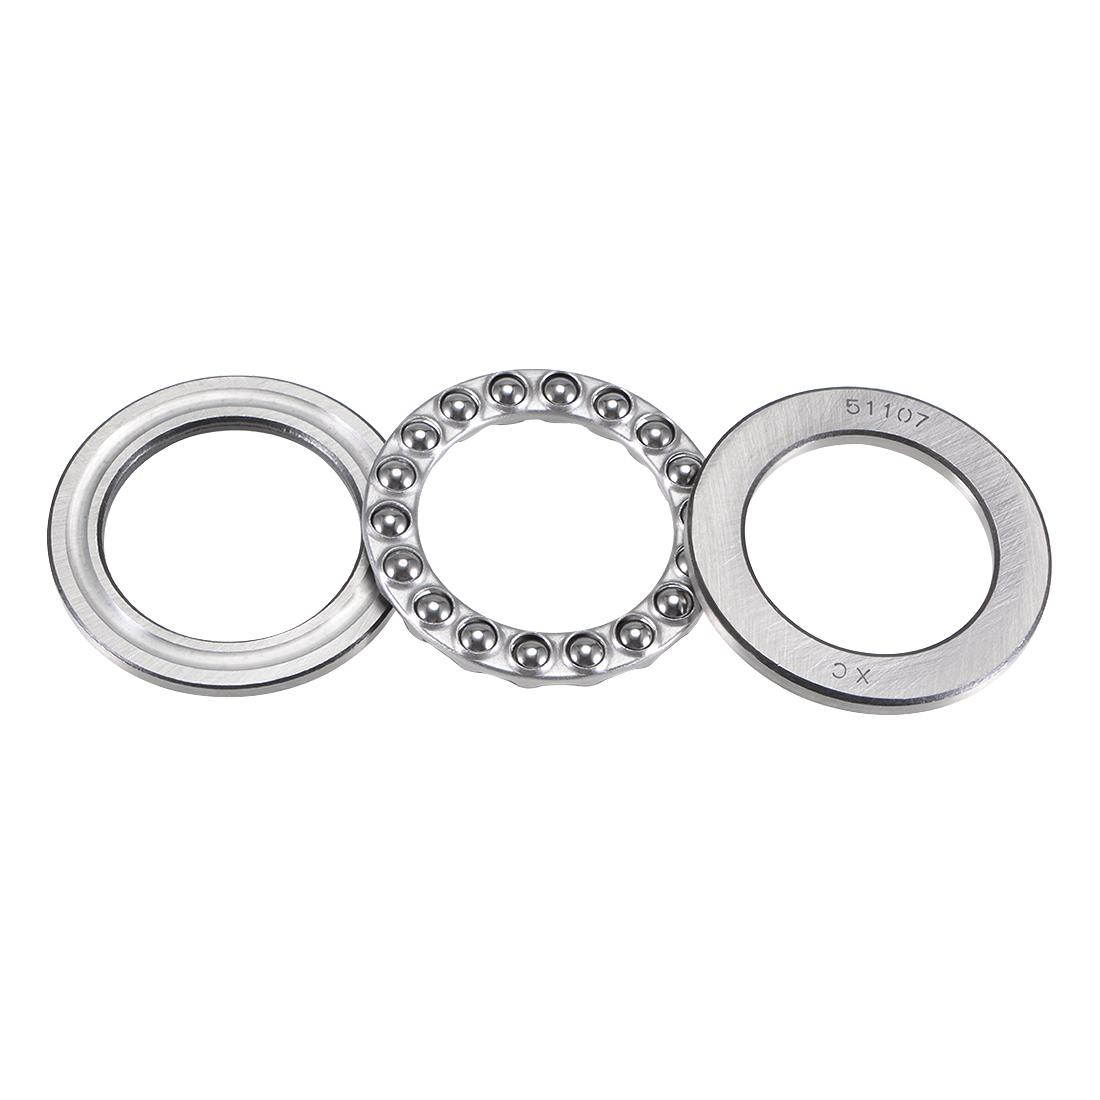 Carbon Steel Ball Thrust Bearing 51107 35mm x 52mm x 12mm